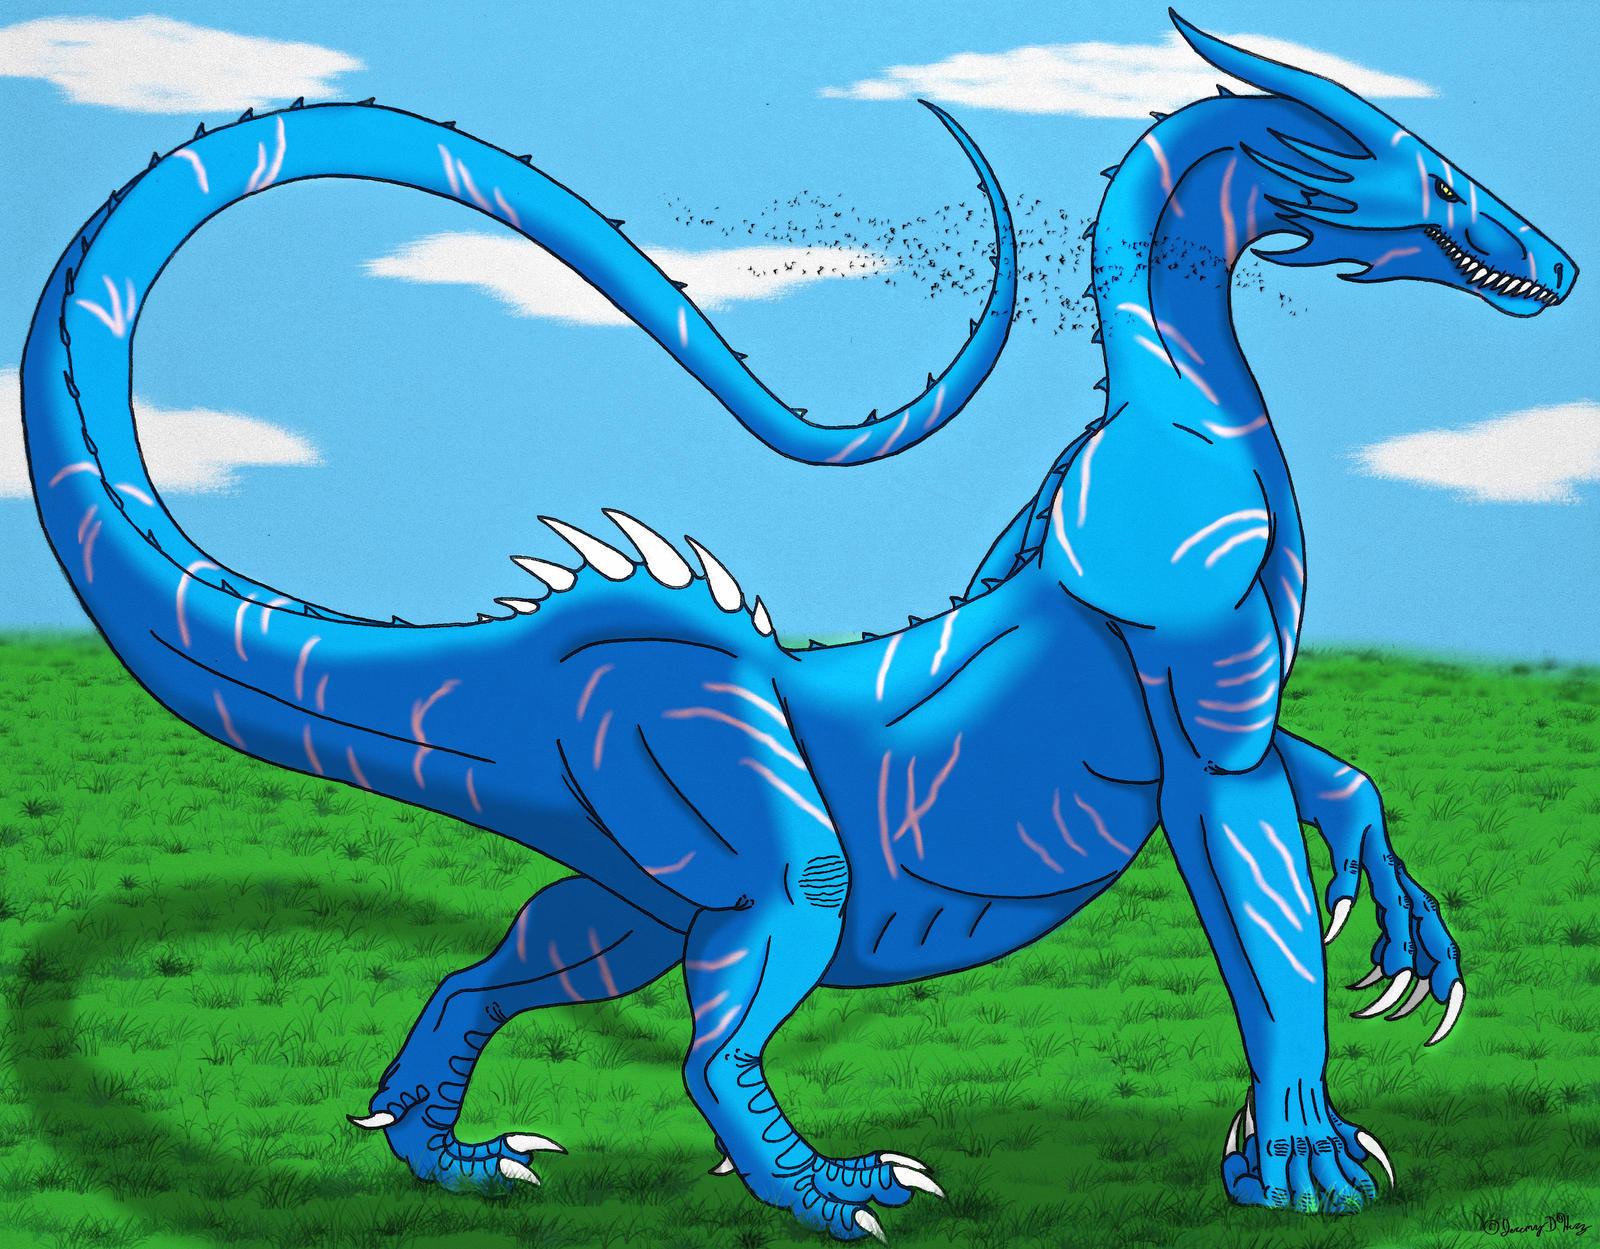 Knuckle-walker Dragon- Color rendition